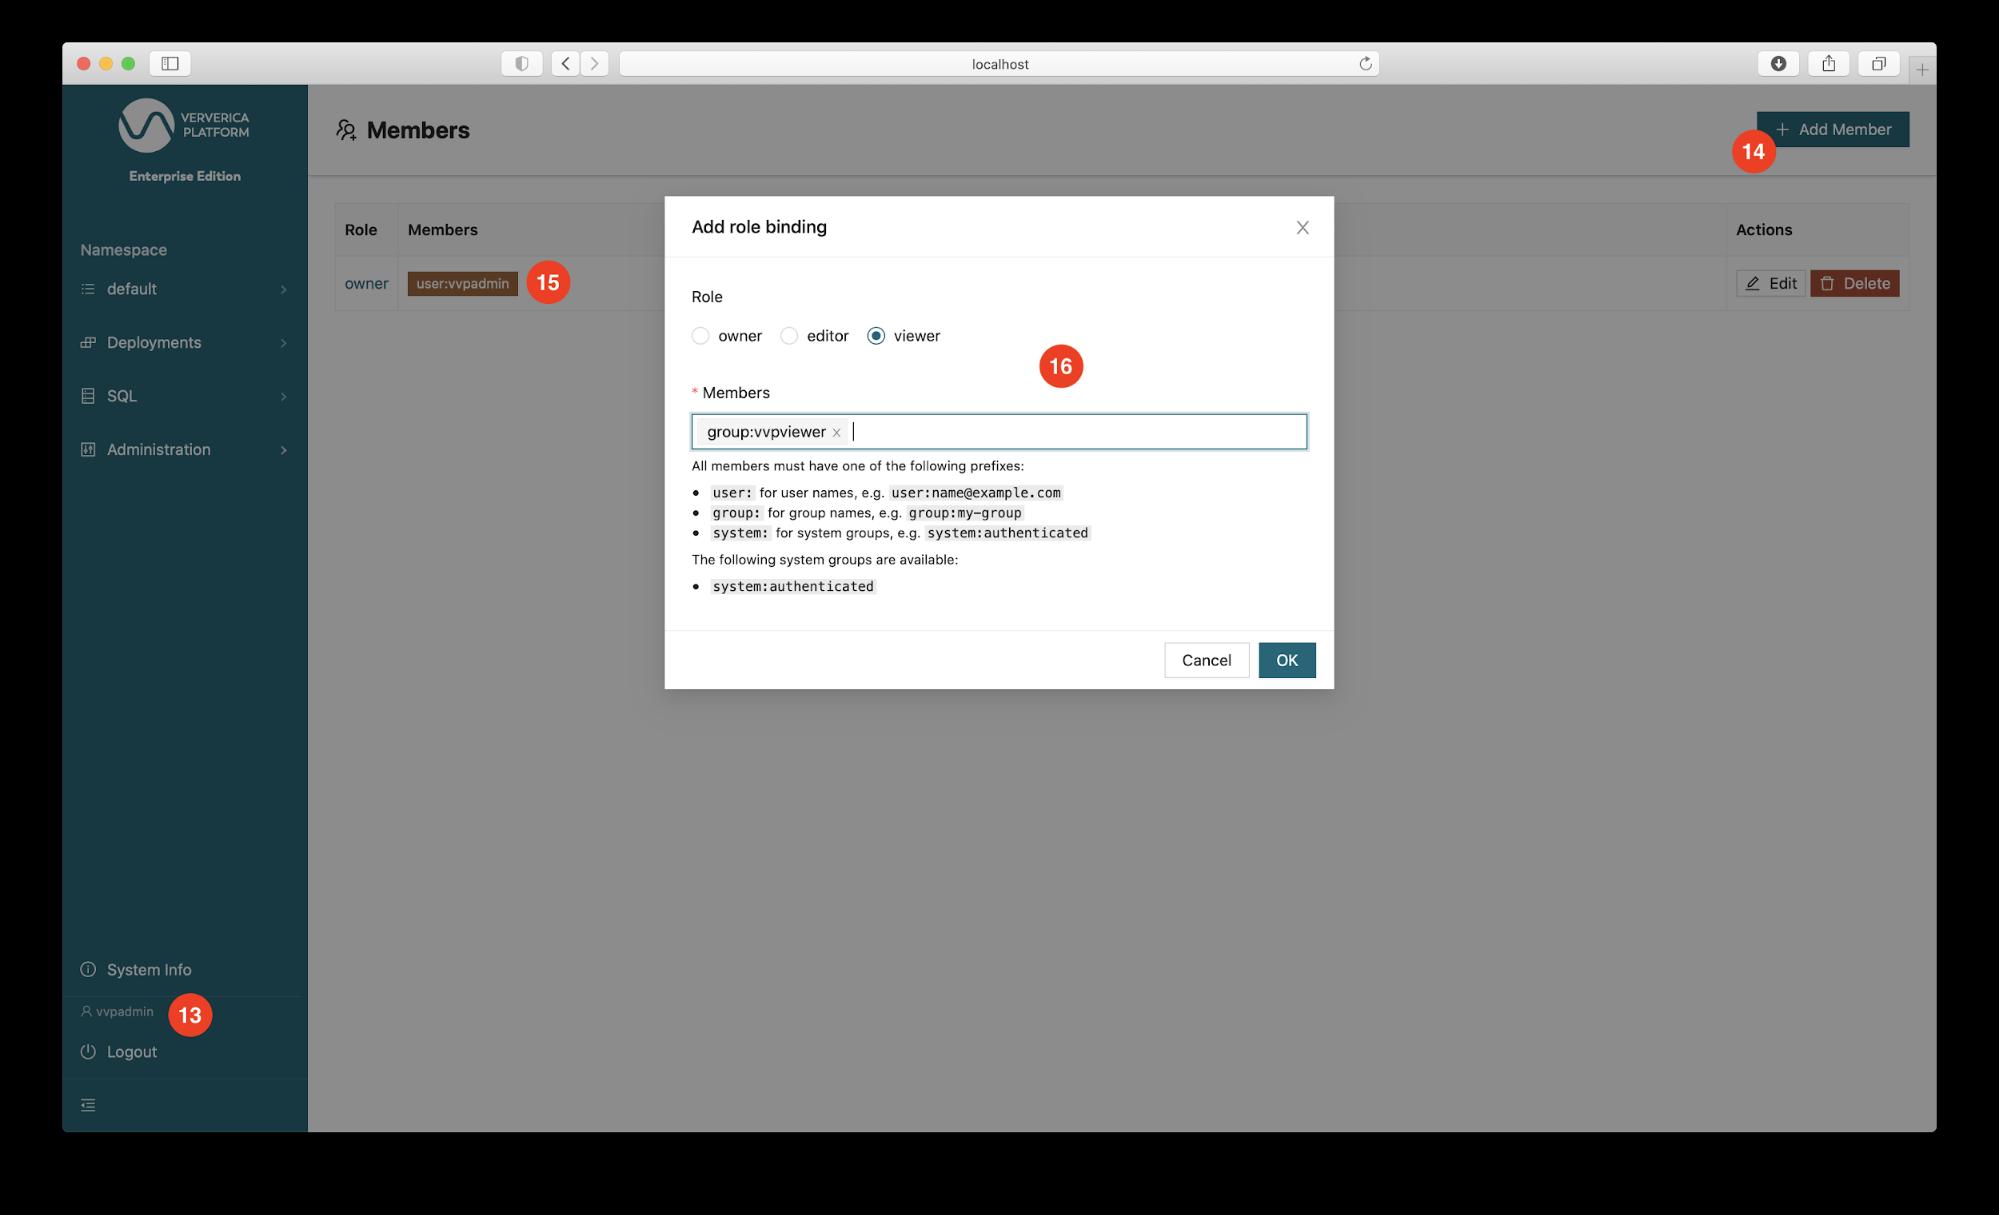 Add role binding, Ververica Platform